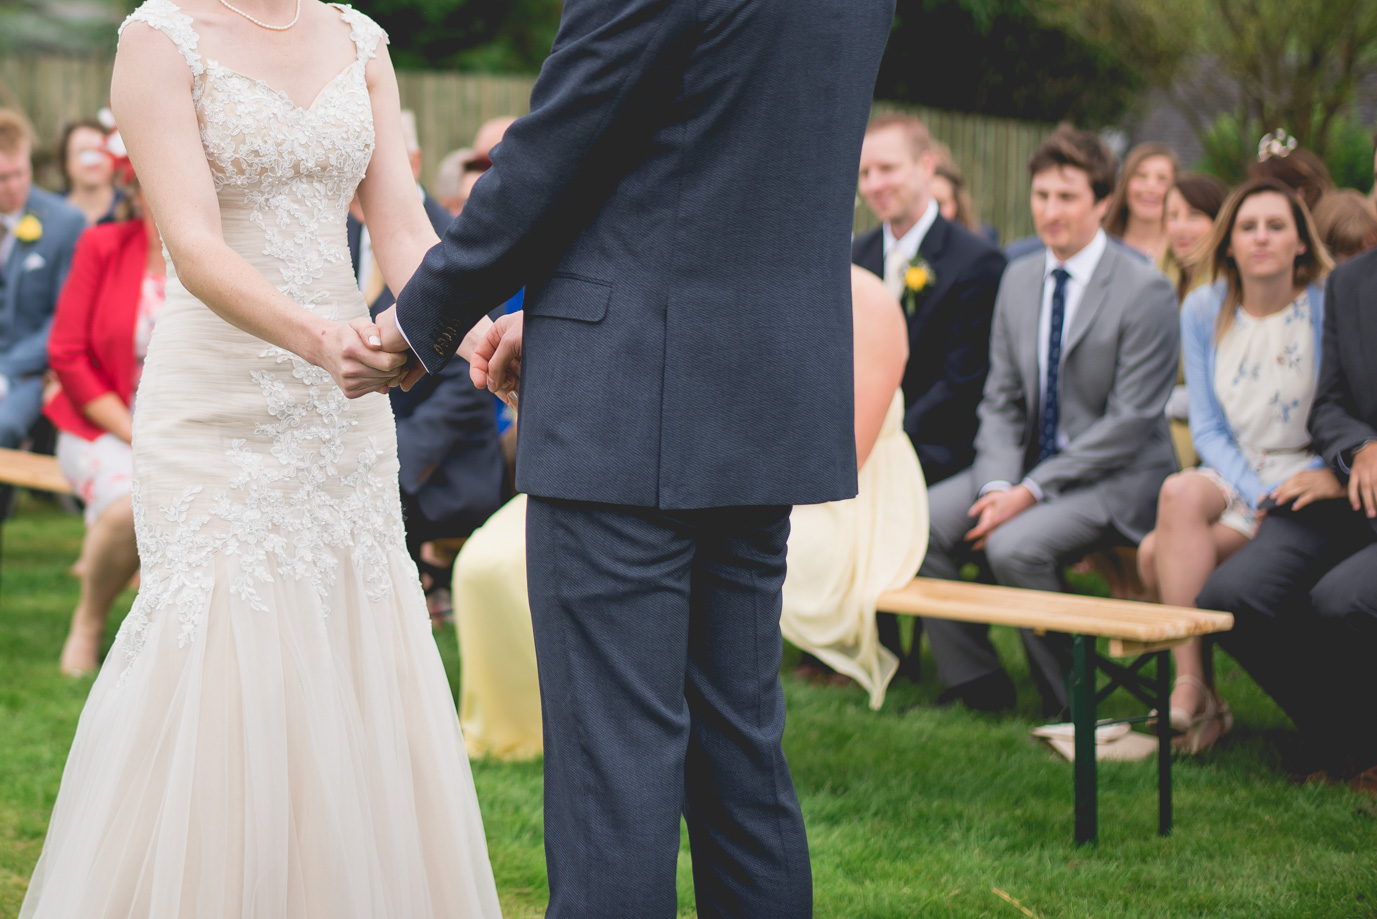 Peak+district+farm+wedding+lower+damgate+photographer-120.jpg